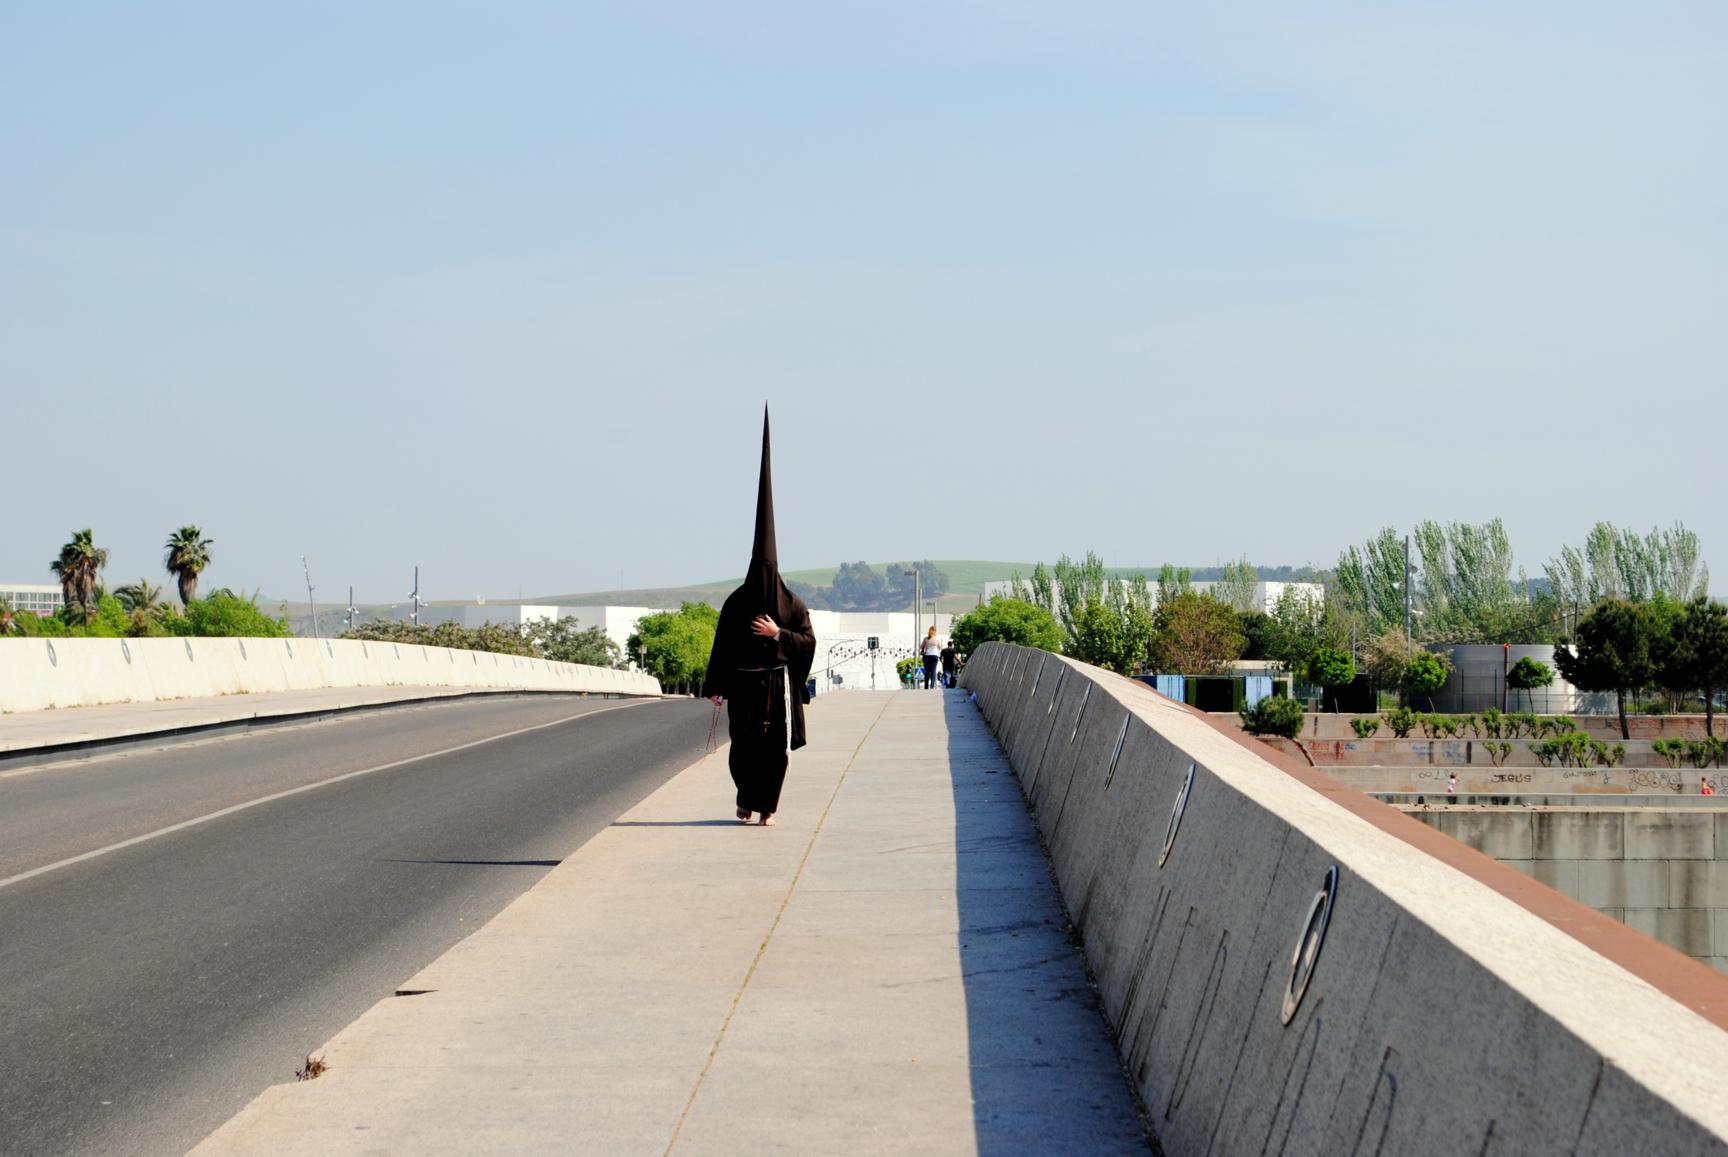 puente-miraflores-cordoba